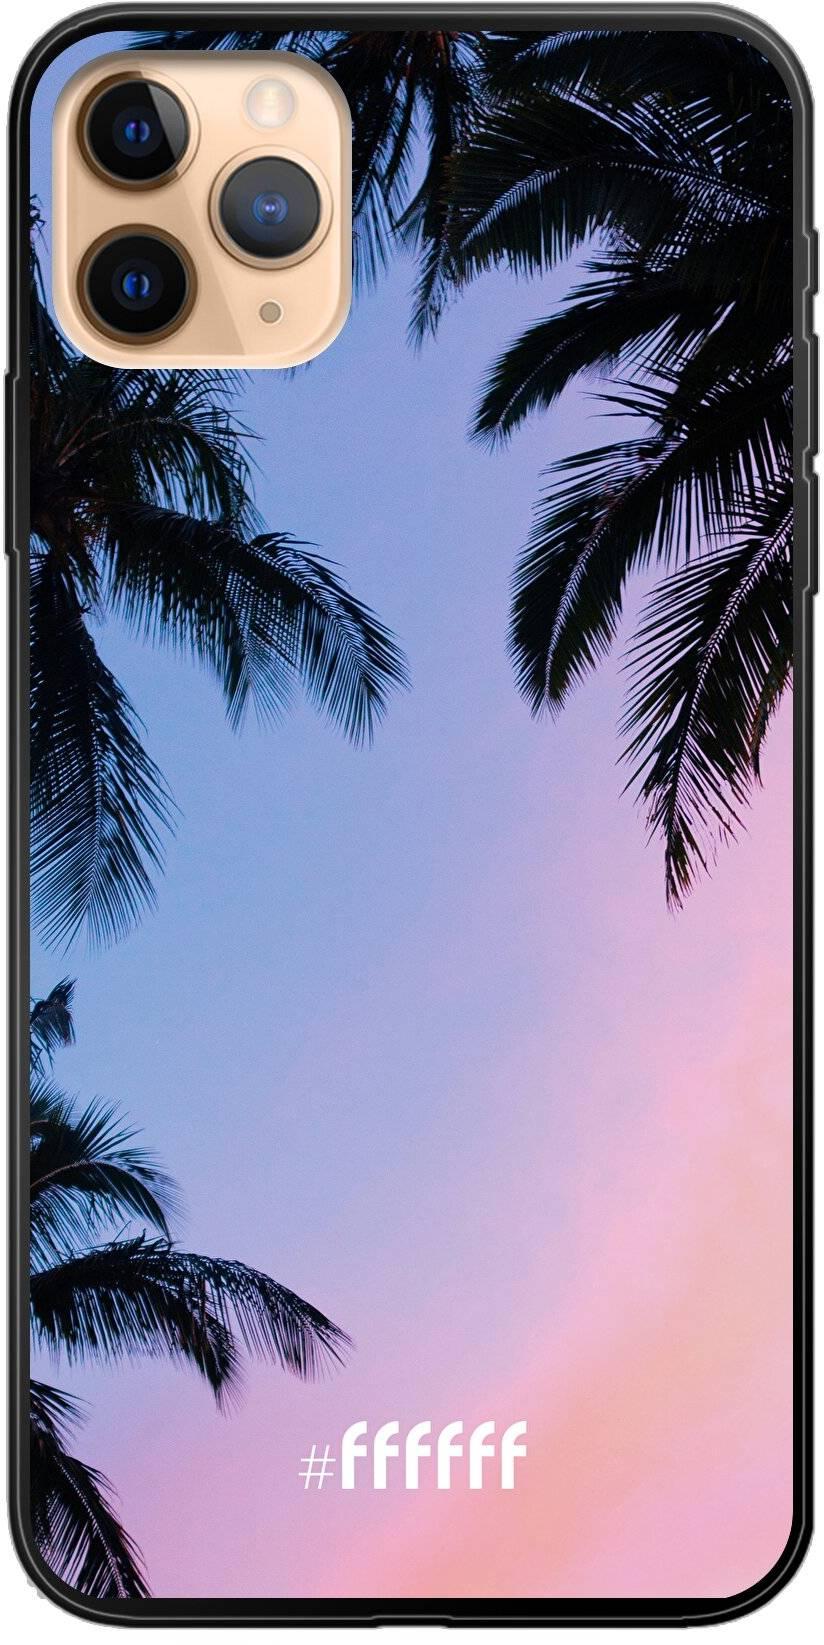 Sunset Palms iPhone 11 Pro Max